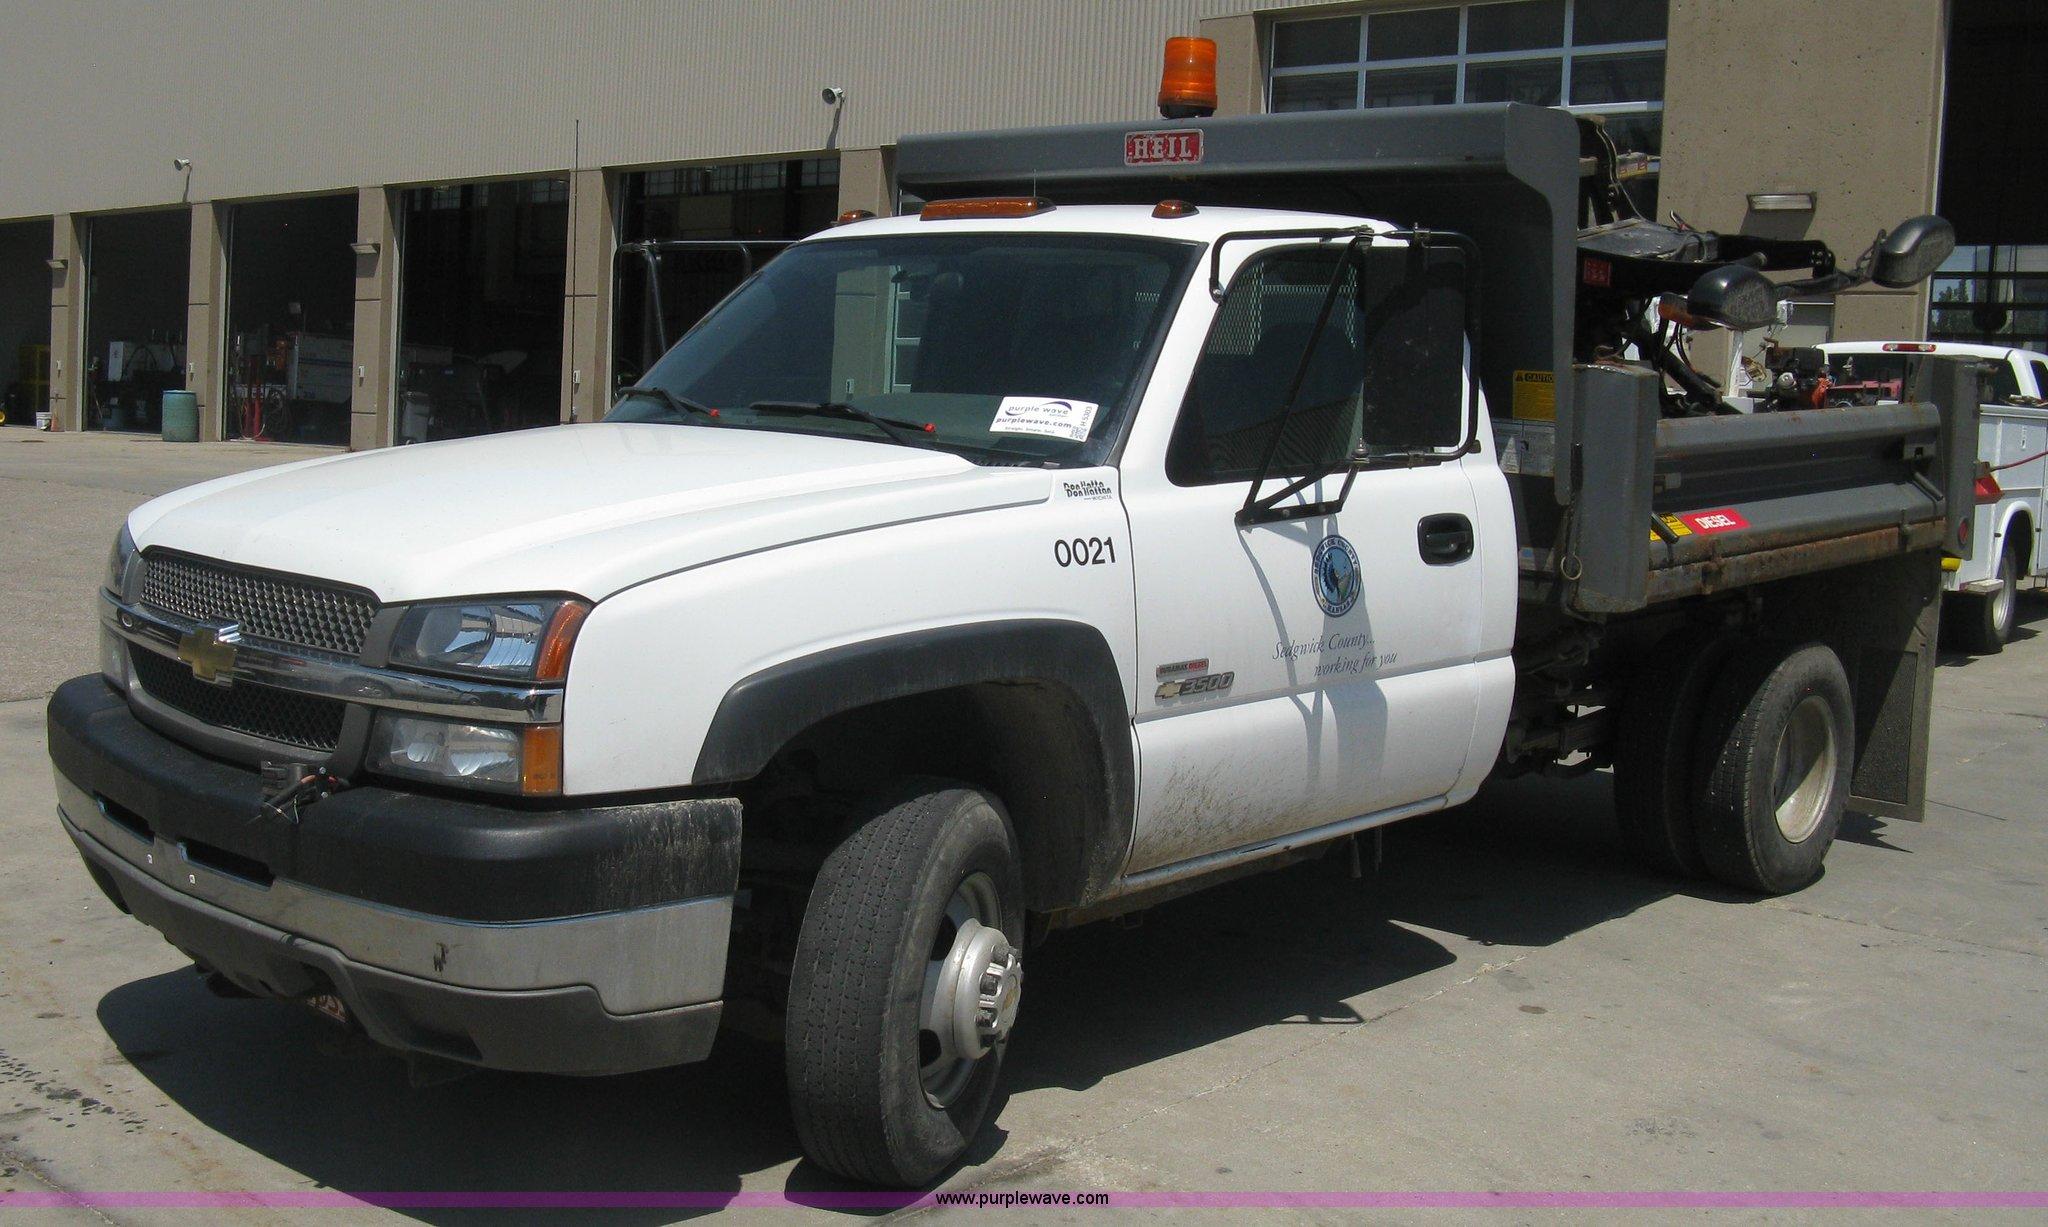 2004 Chevrolet Silverado 3500 dump bed truck Item H5303